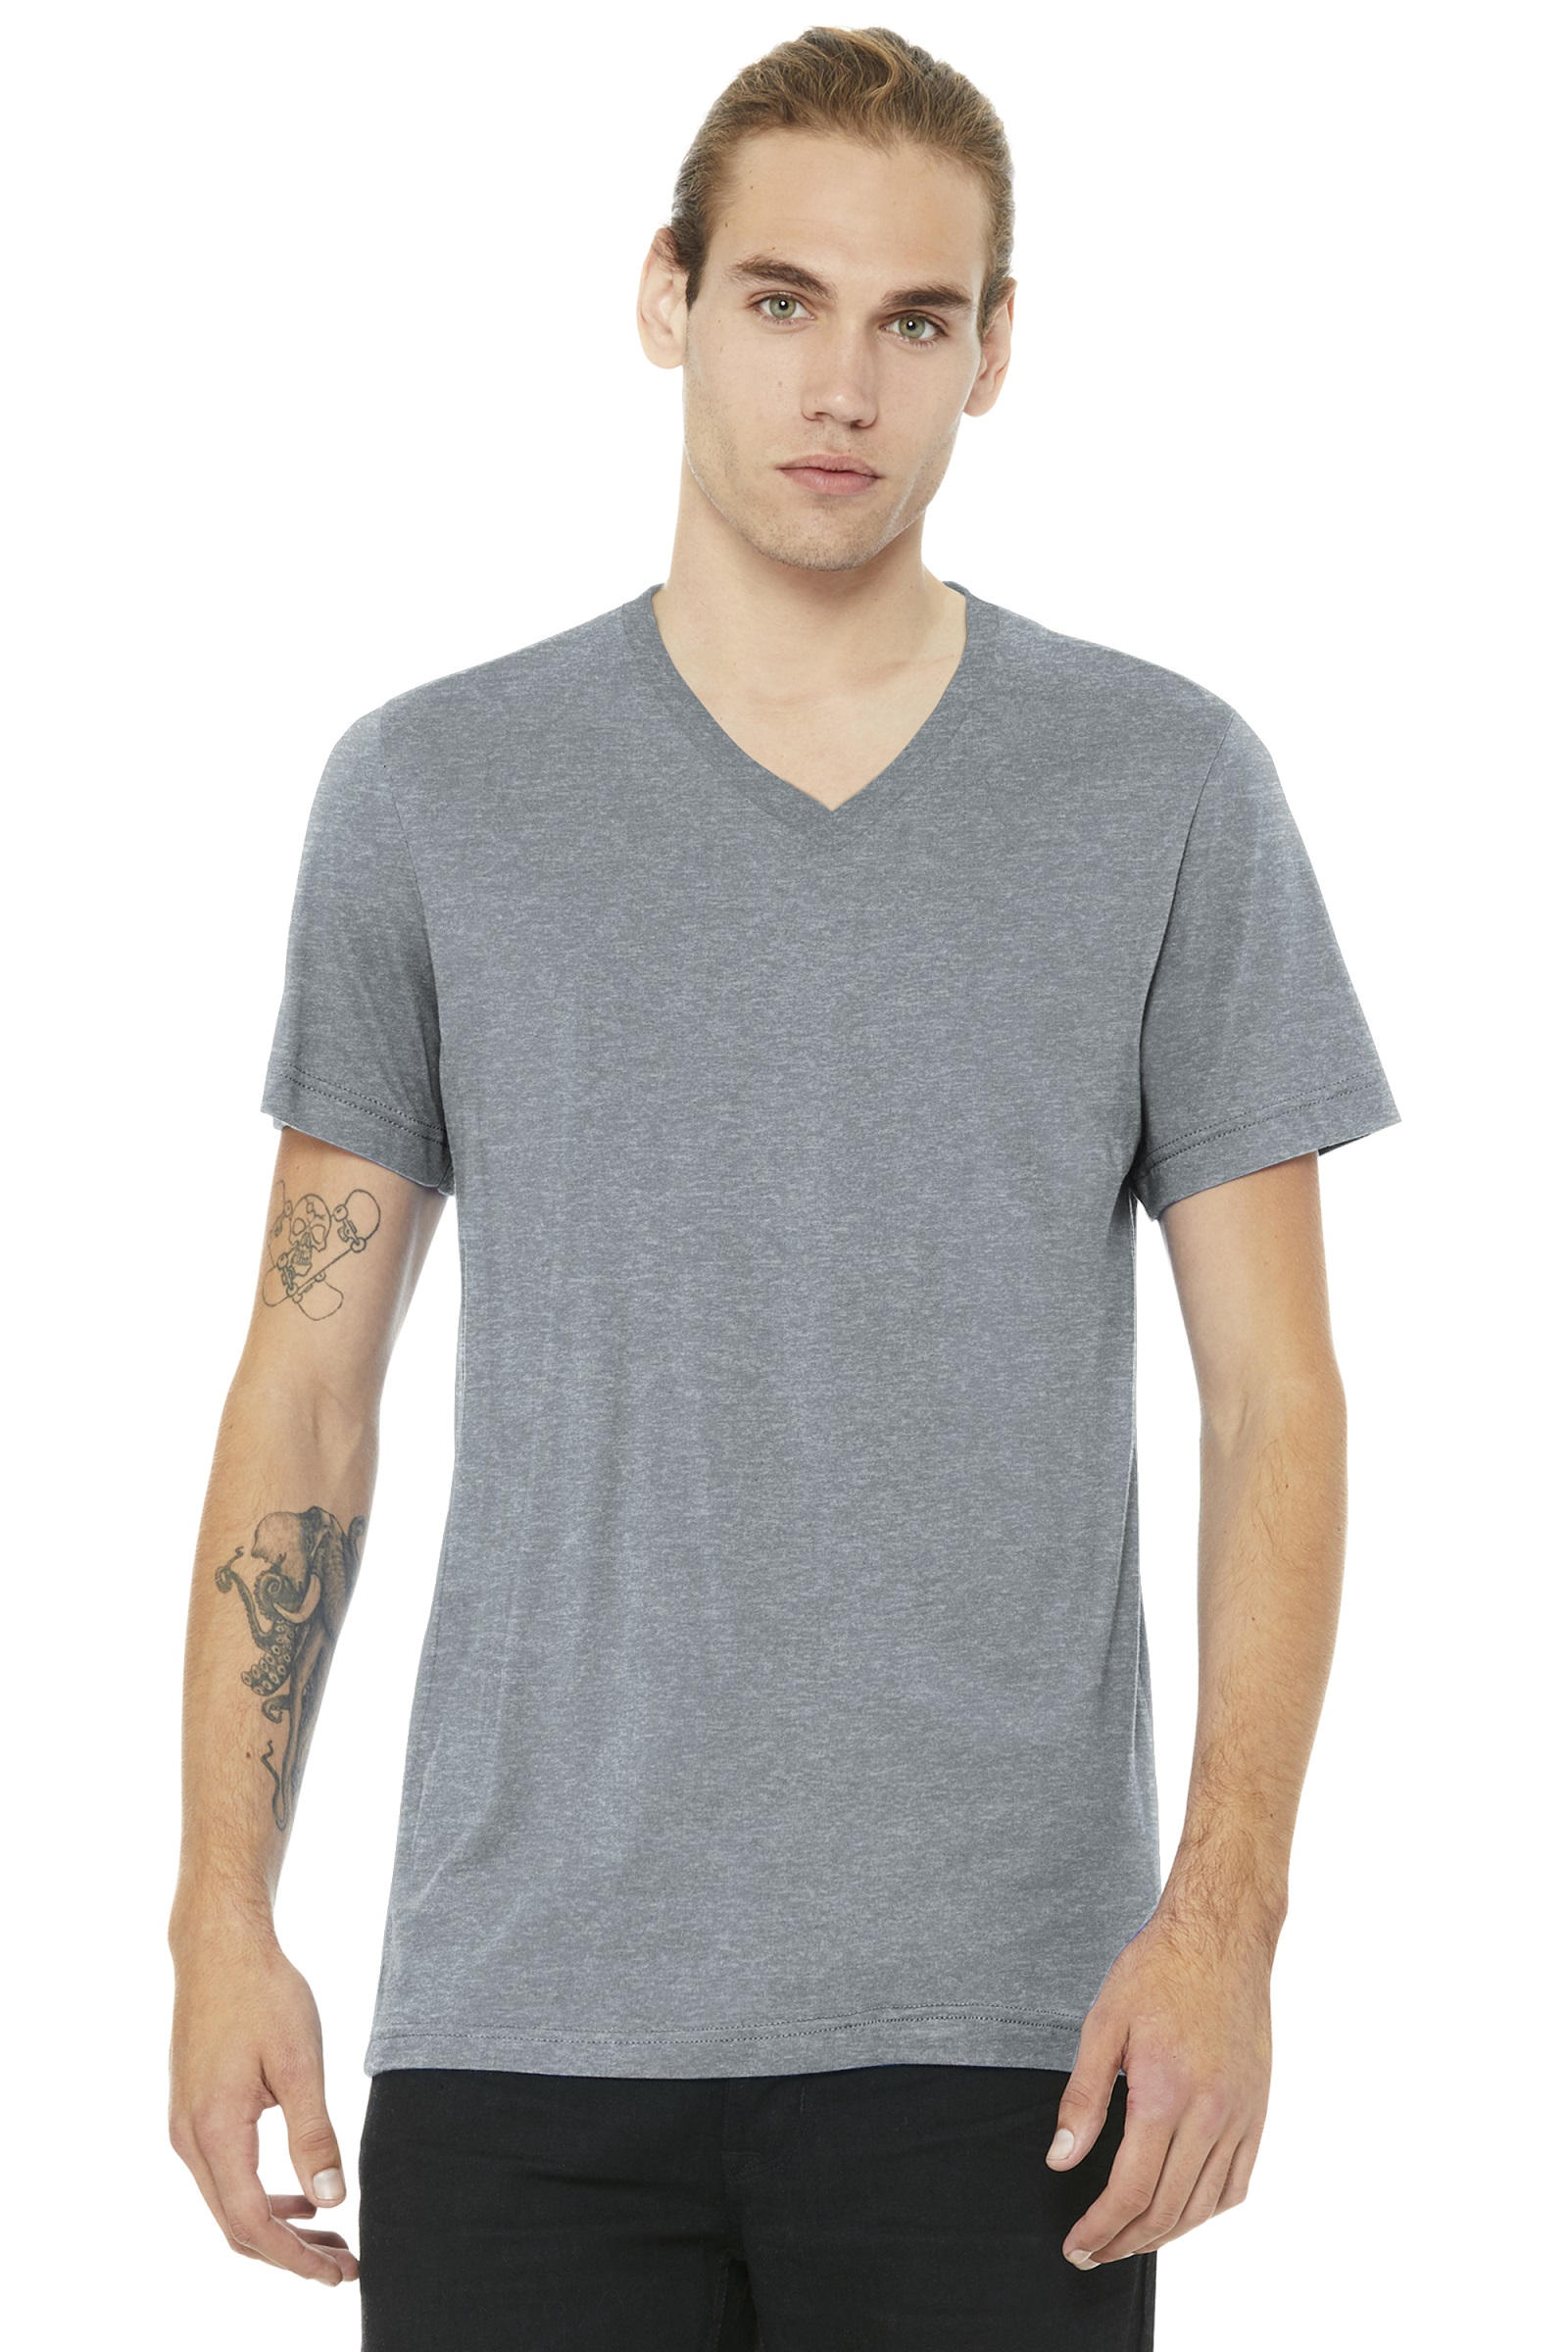 Bella+Canvas Printed Men's Jersey Short Sleeve V-Neck Tee